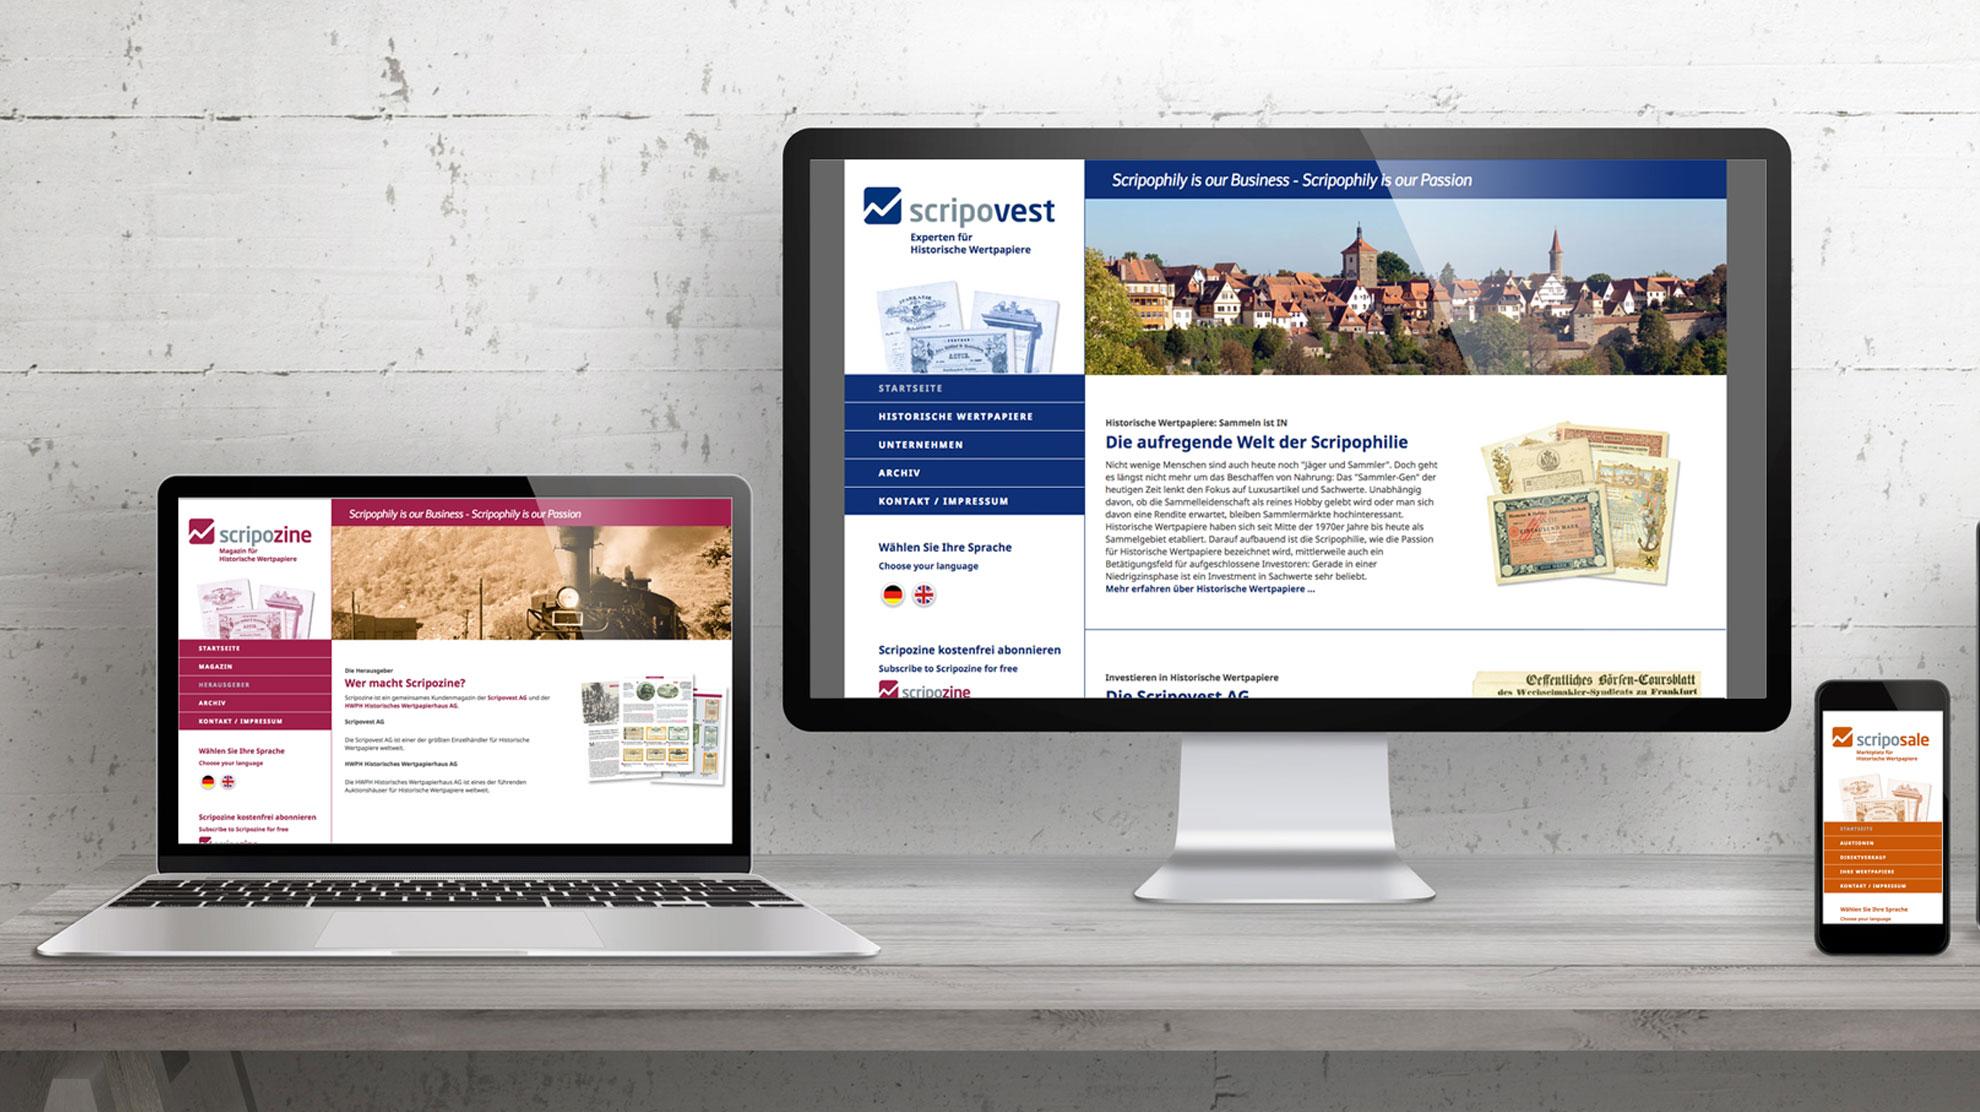 punktneun-Scripovest-Webseite-Responsive-Design